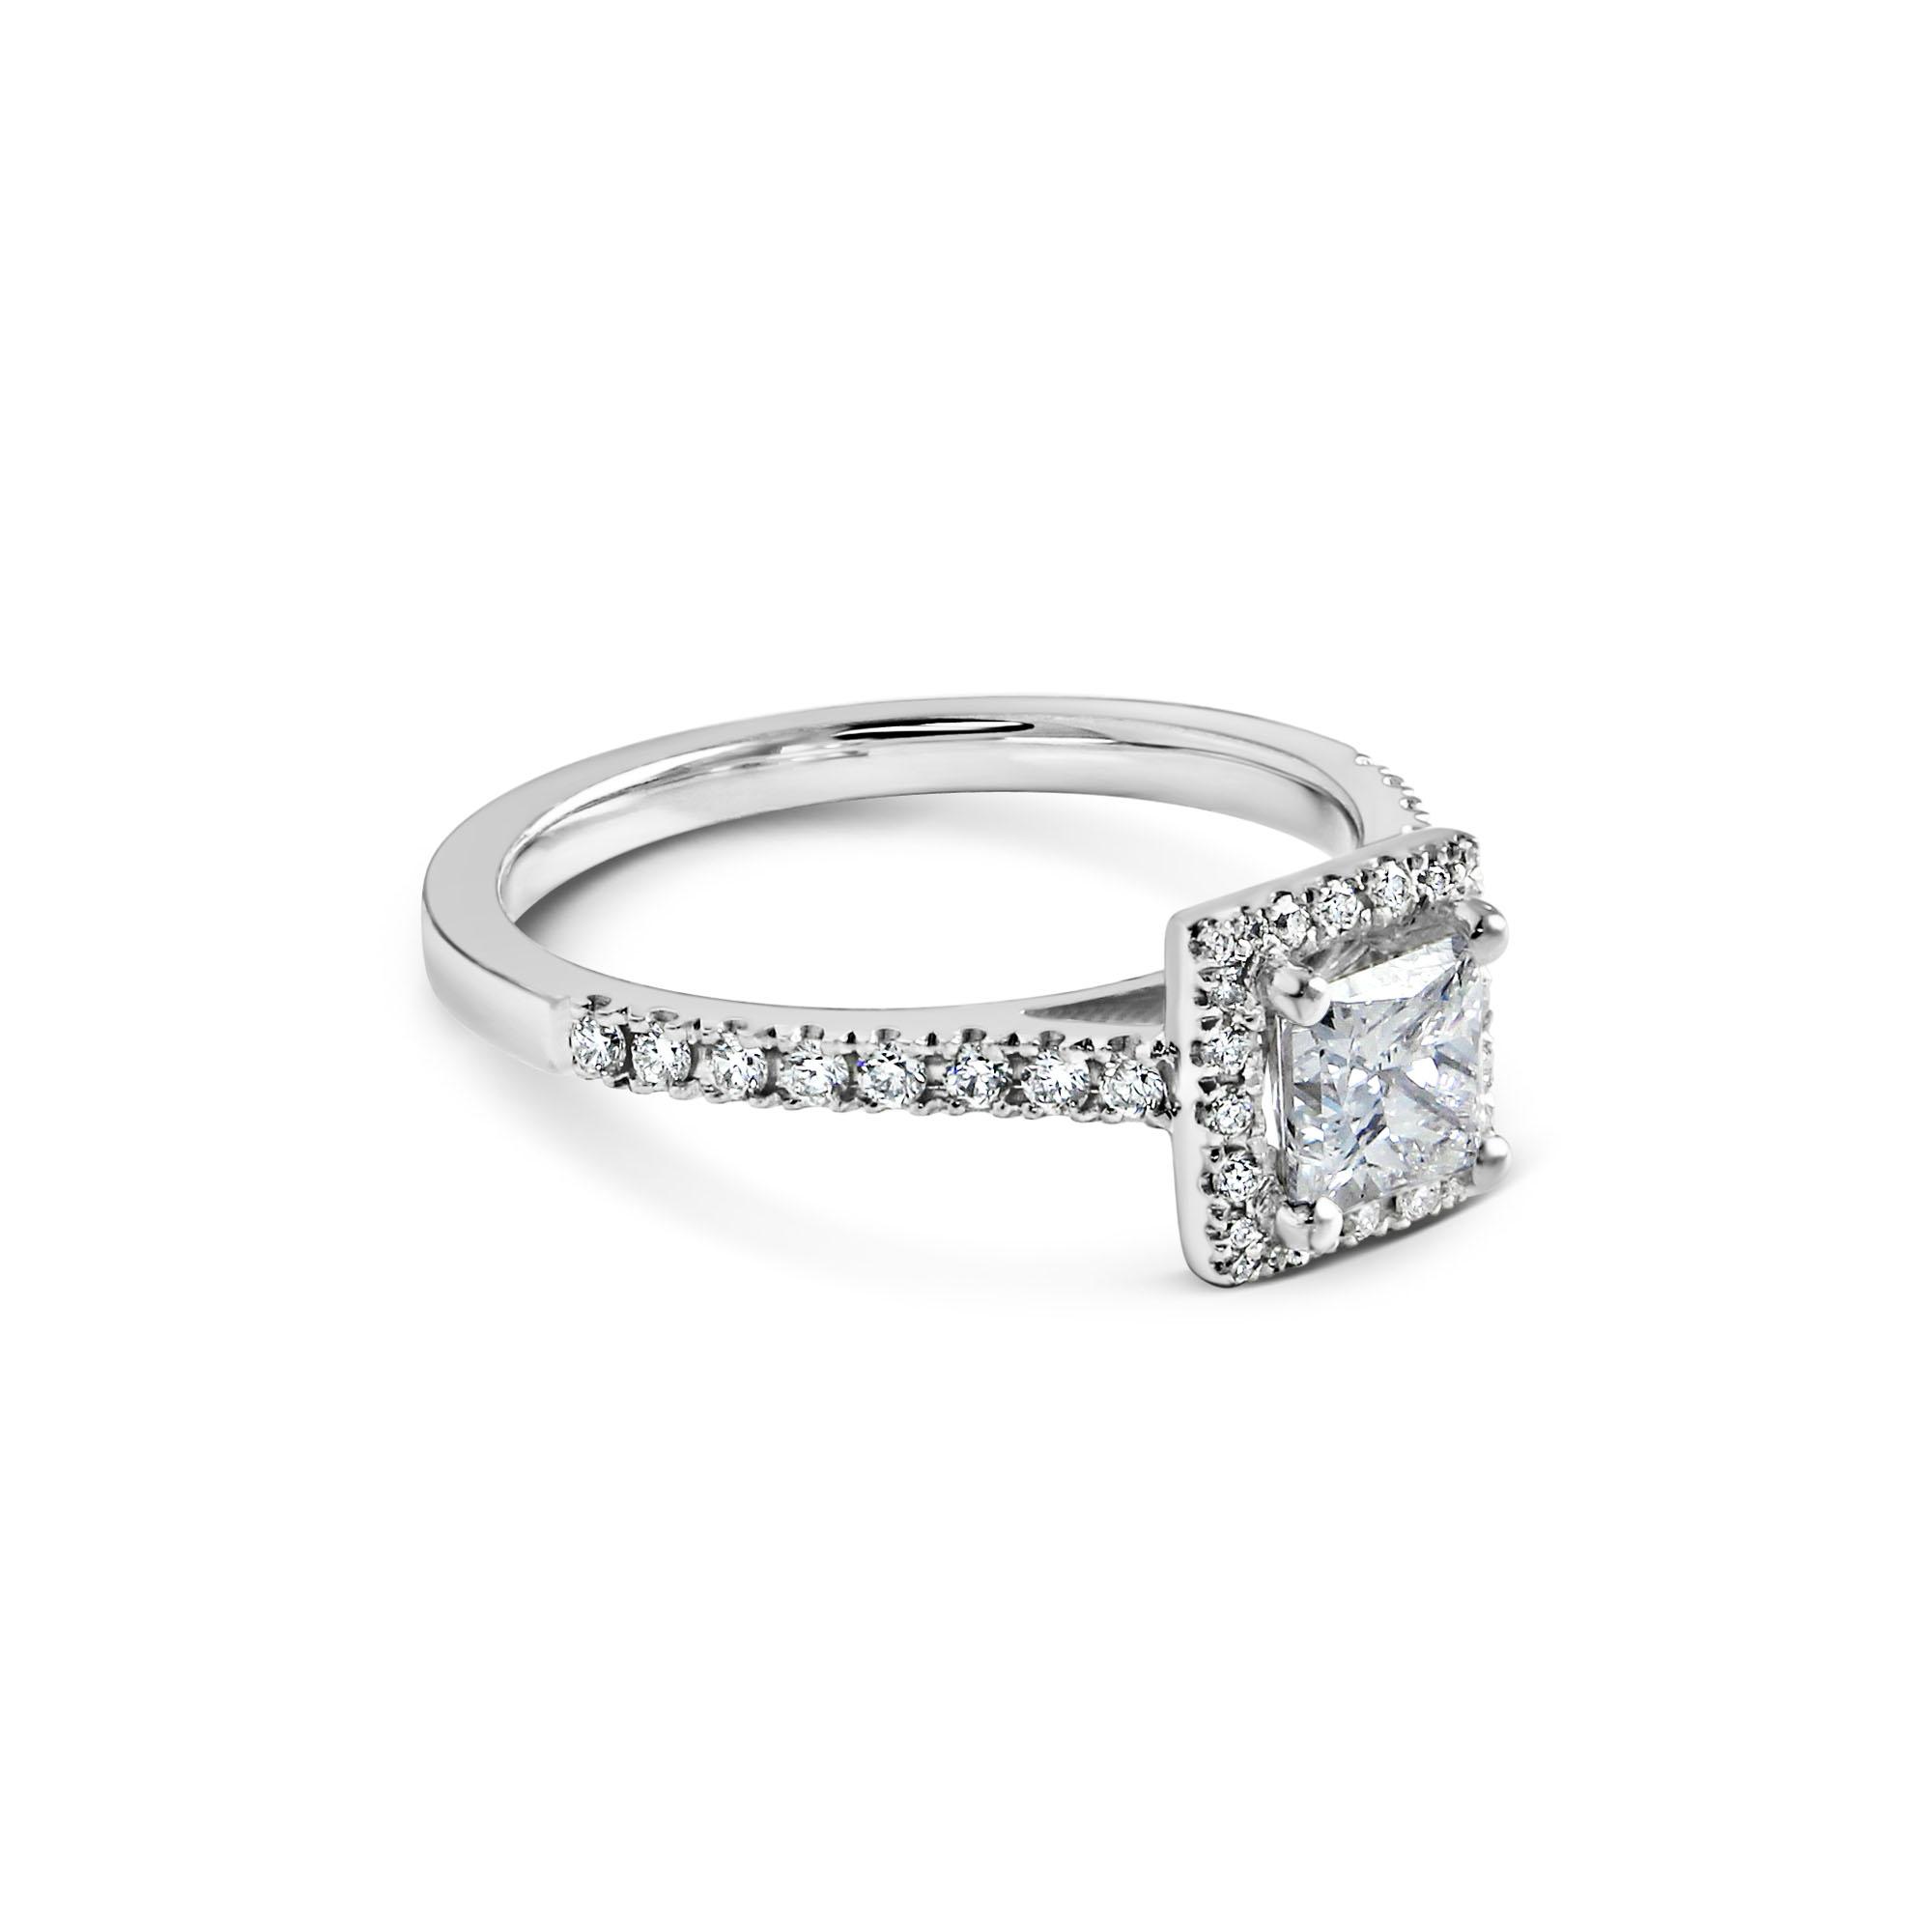 cad-man-jewellery-princess-ring.jpg